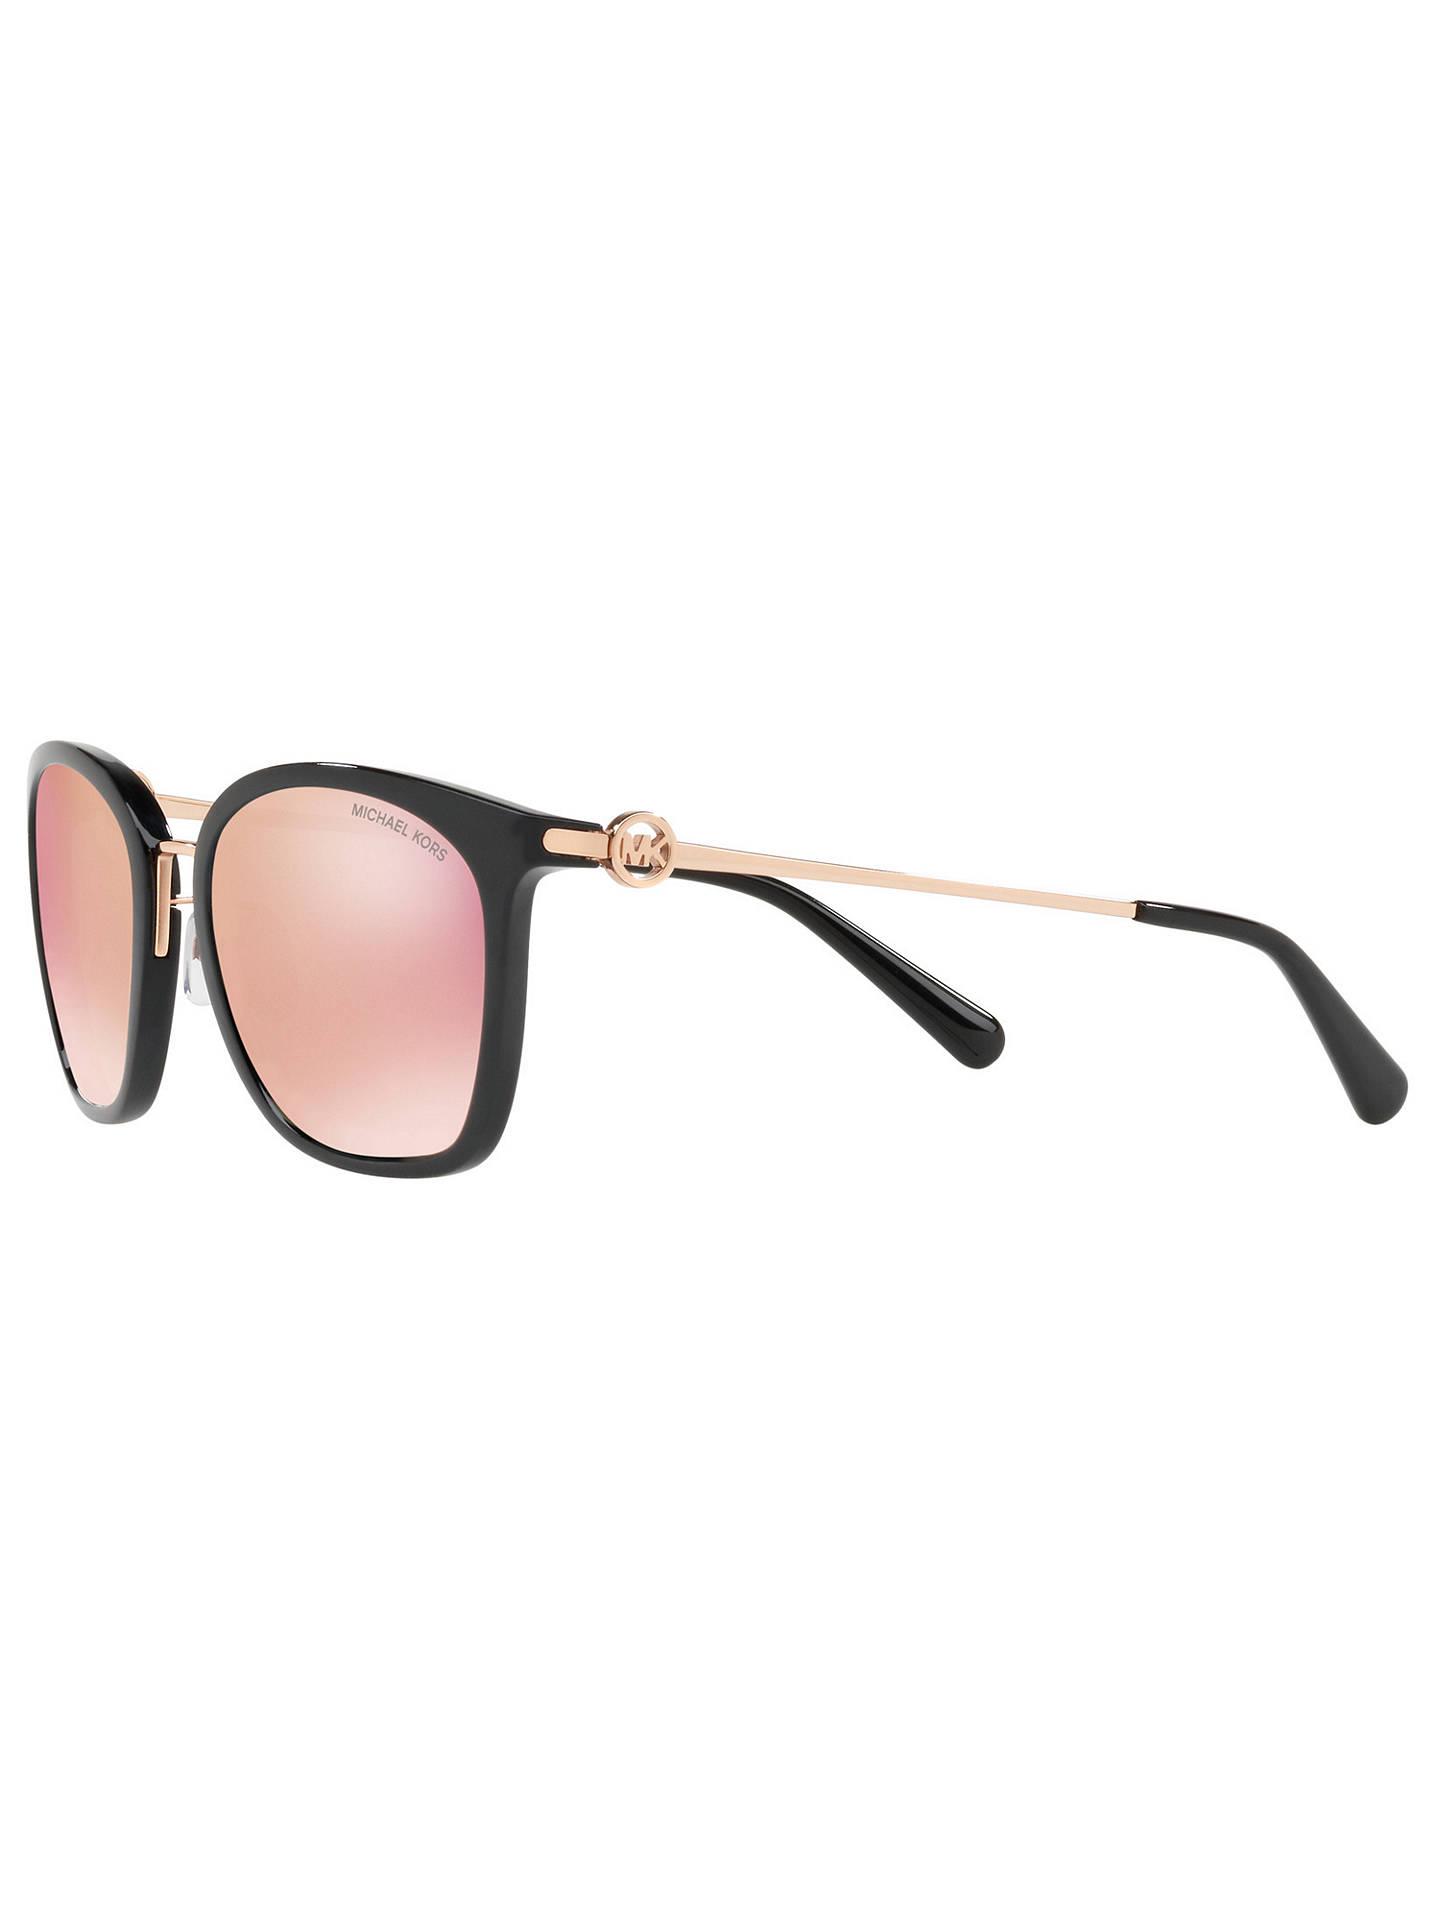 bfe87a1b4d ... BuyMichael Kors MK2064 Women s Lugano Polarised Square Sunglasses